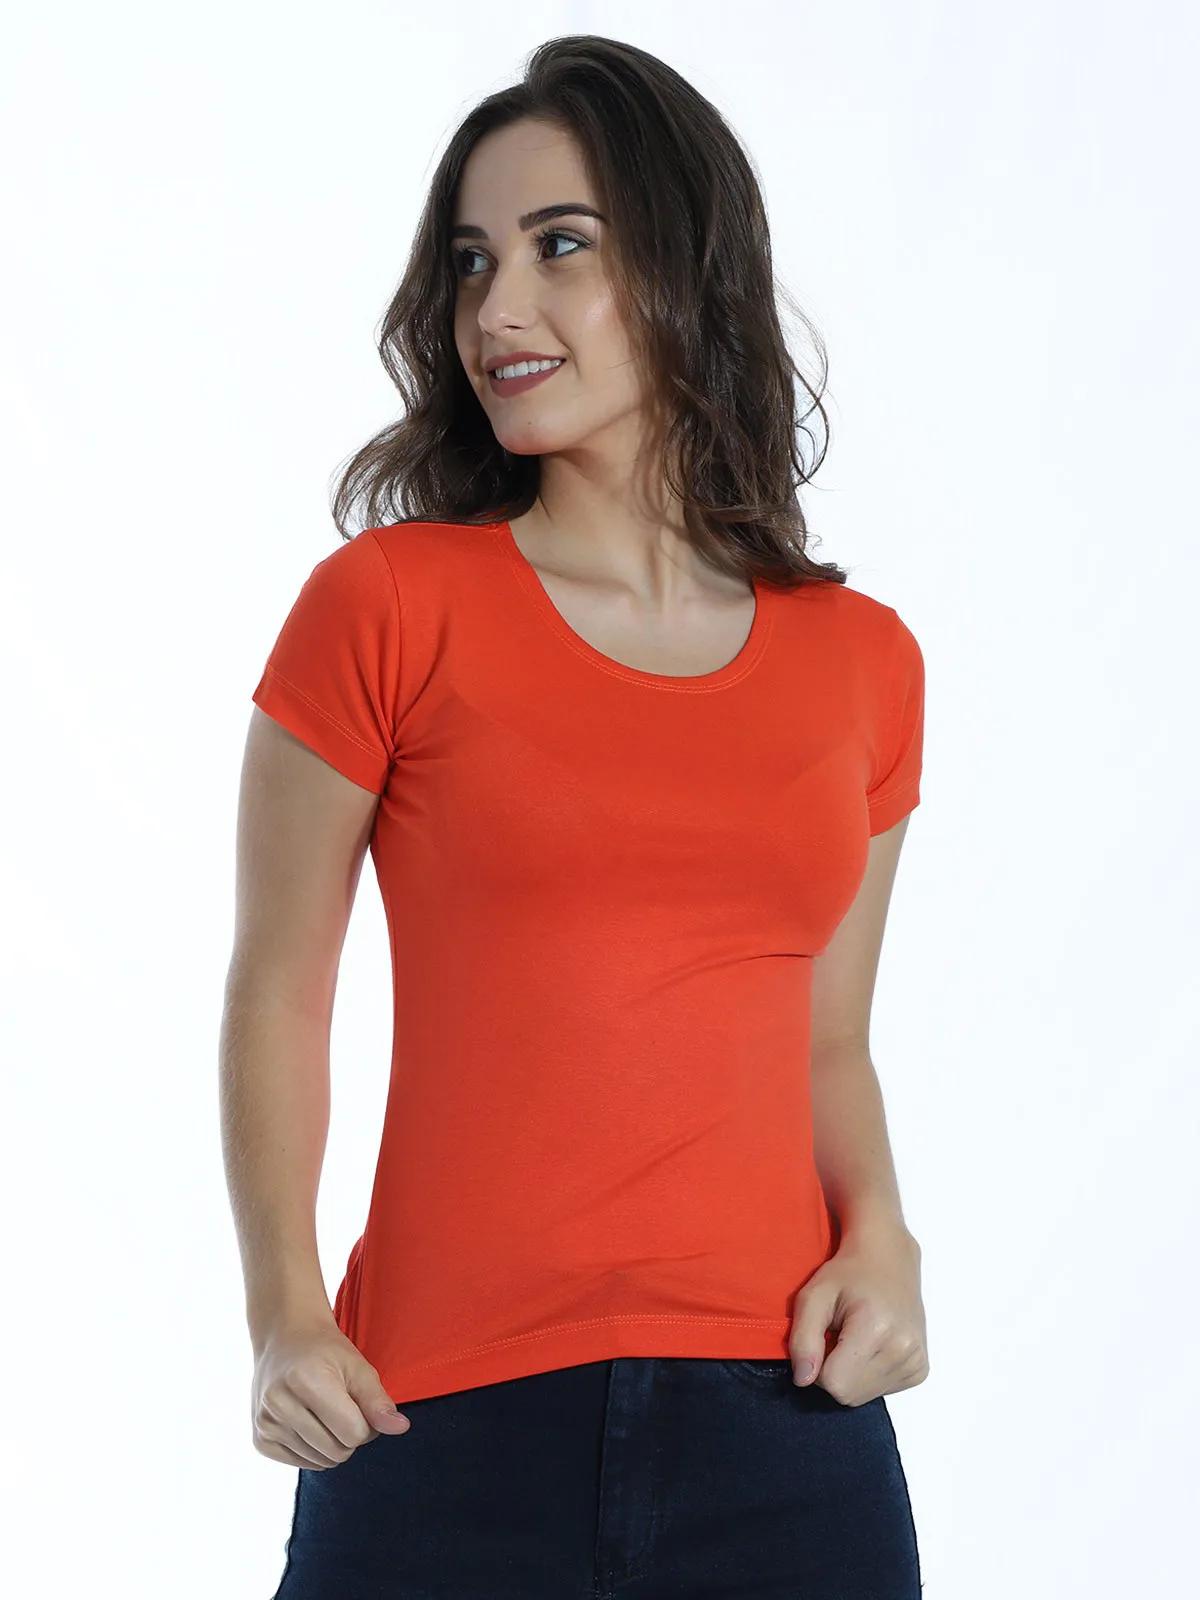 Baby Look Feminina Básica Lisa Viscolycra Decote Redondo Laranja